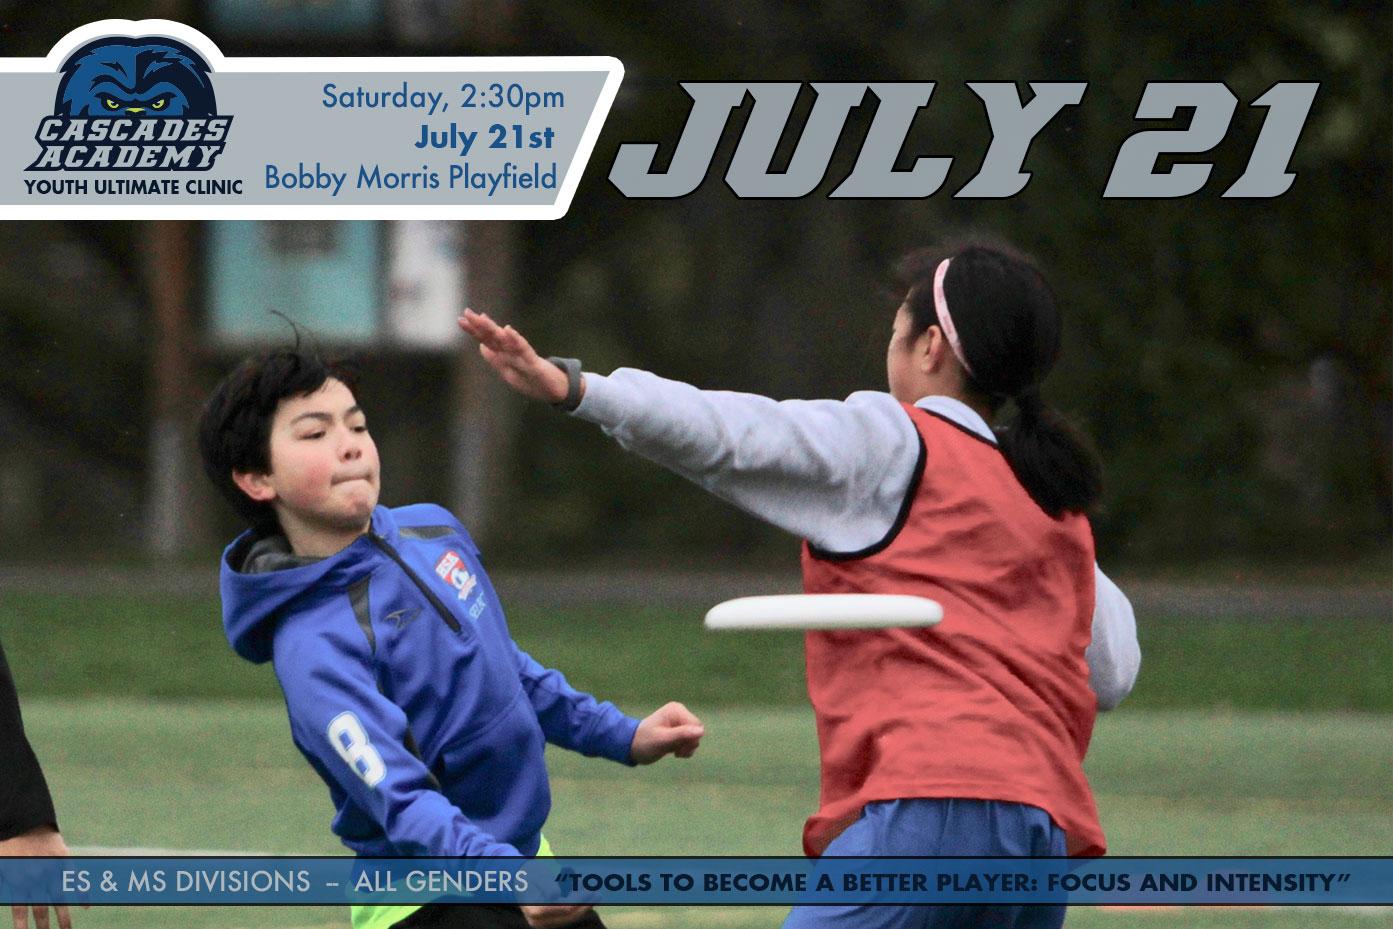 CA-July21-flyer-_.jpg